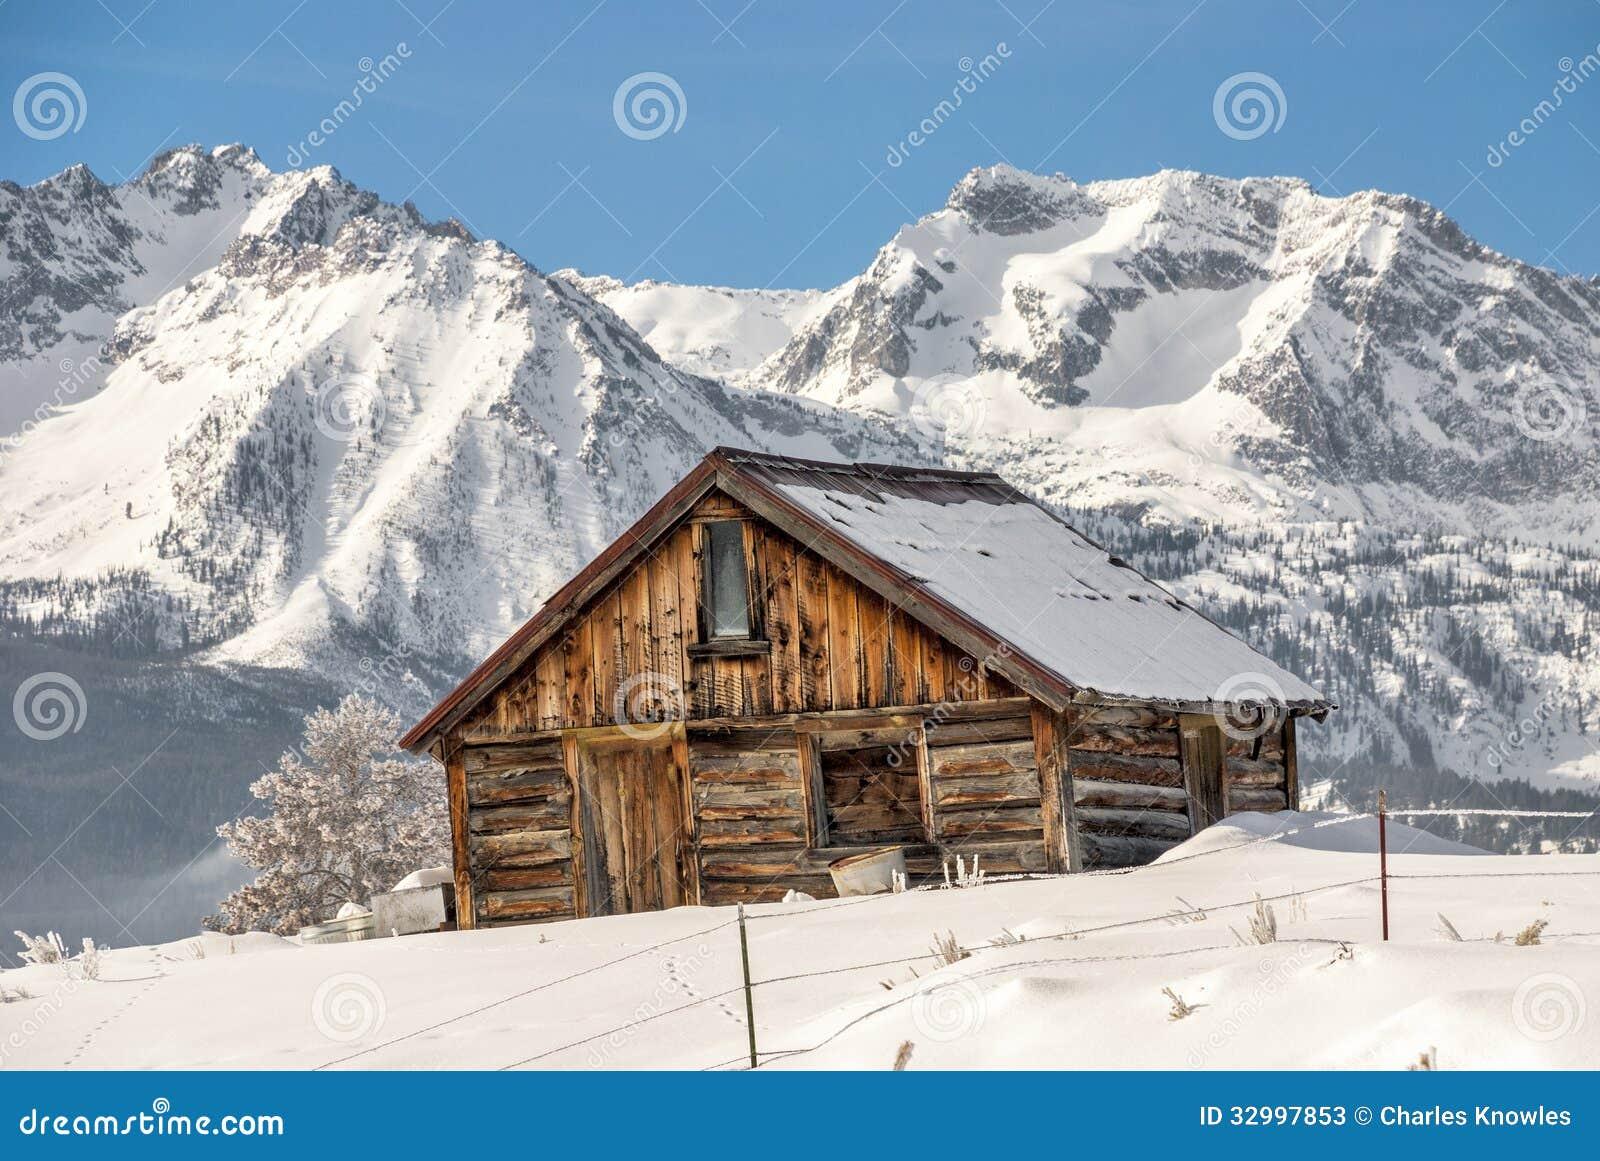 Winter Cabin And Idaho Mountains Stock Photos - Image: 32997853